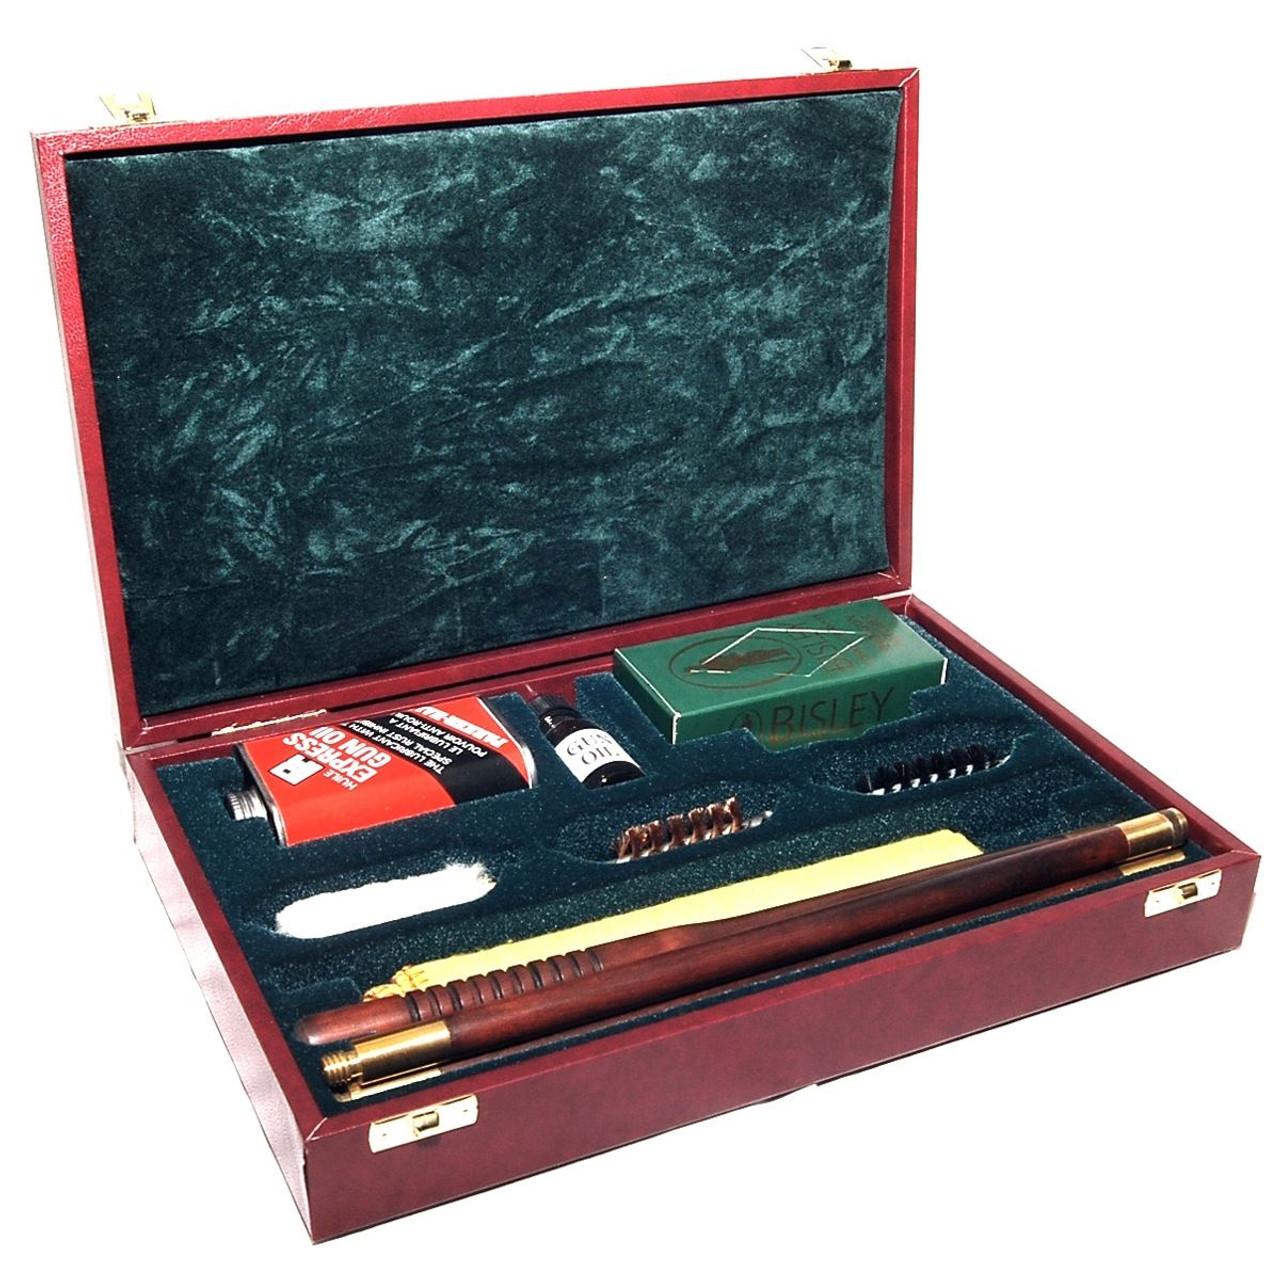 Parker Hale Sandringham Shotgun Cleaning Kit